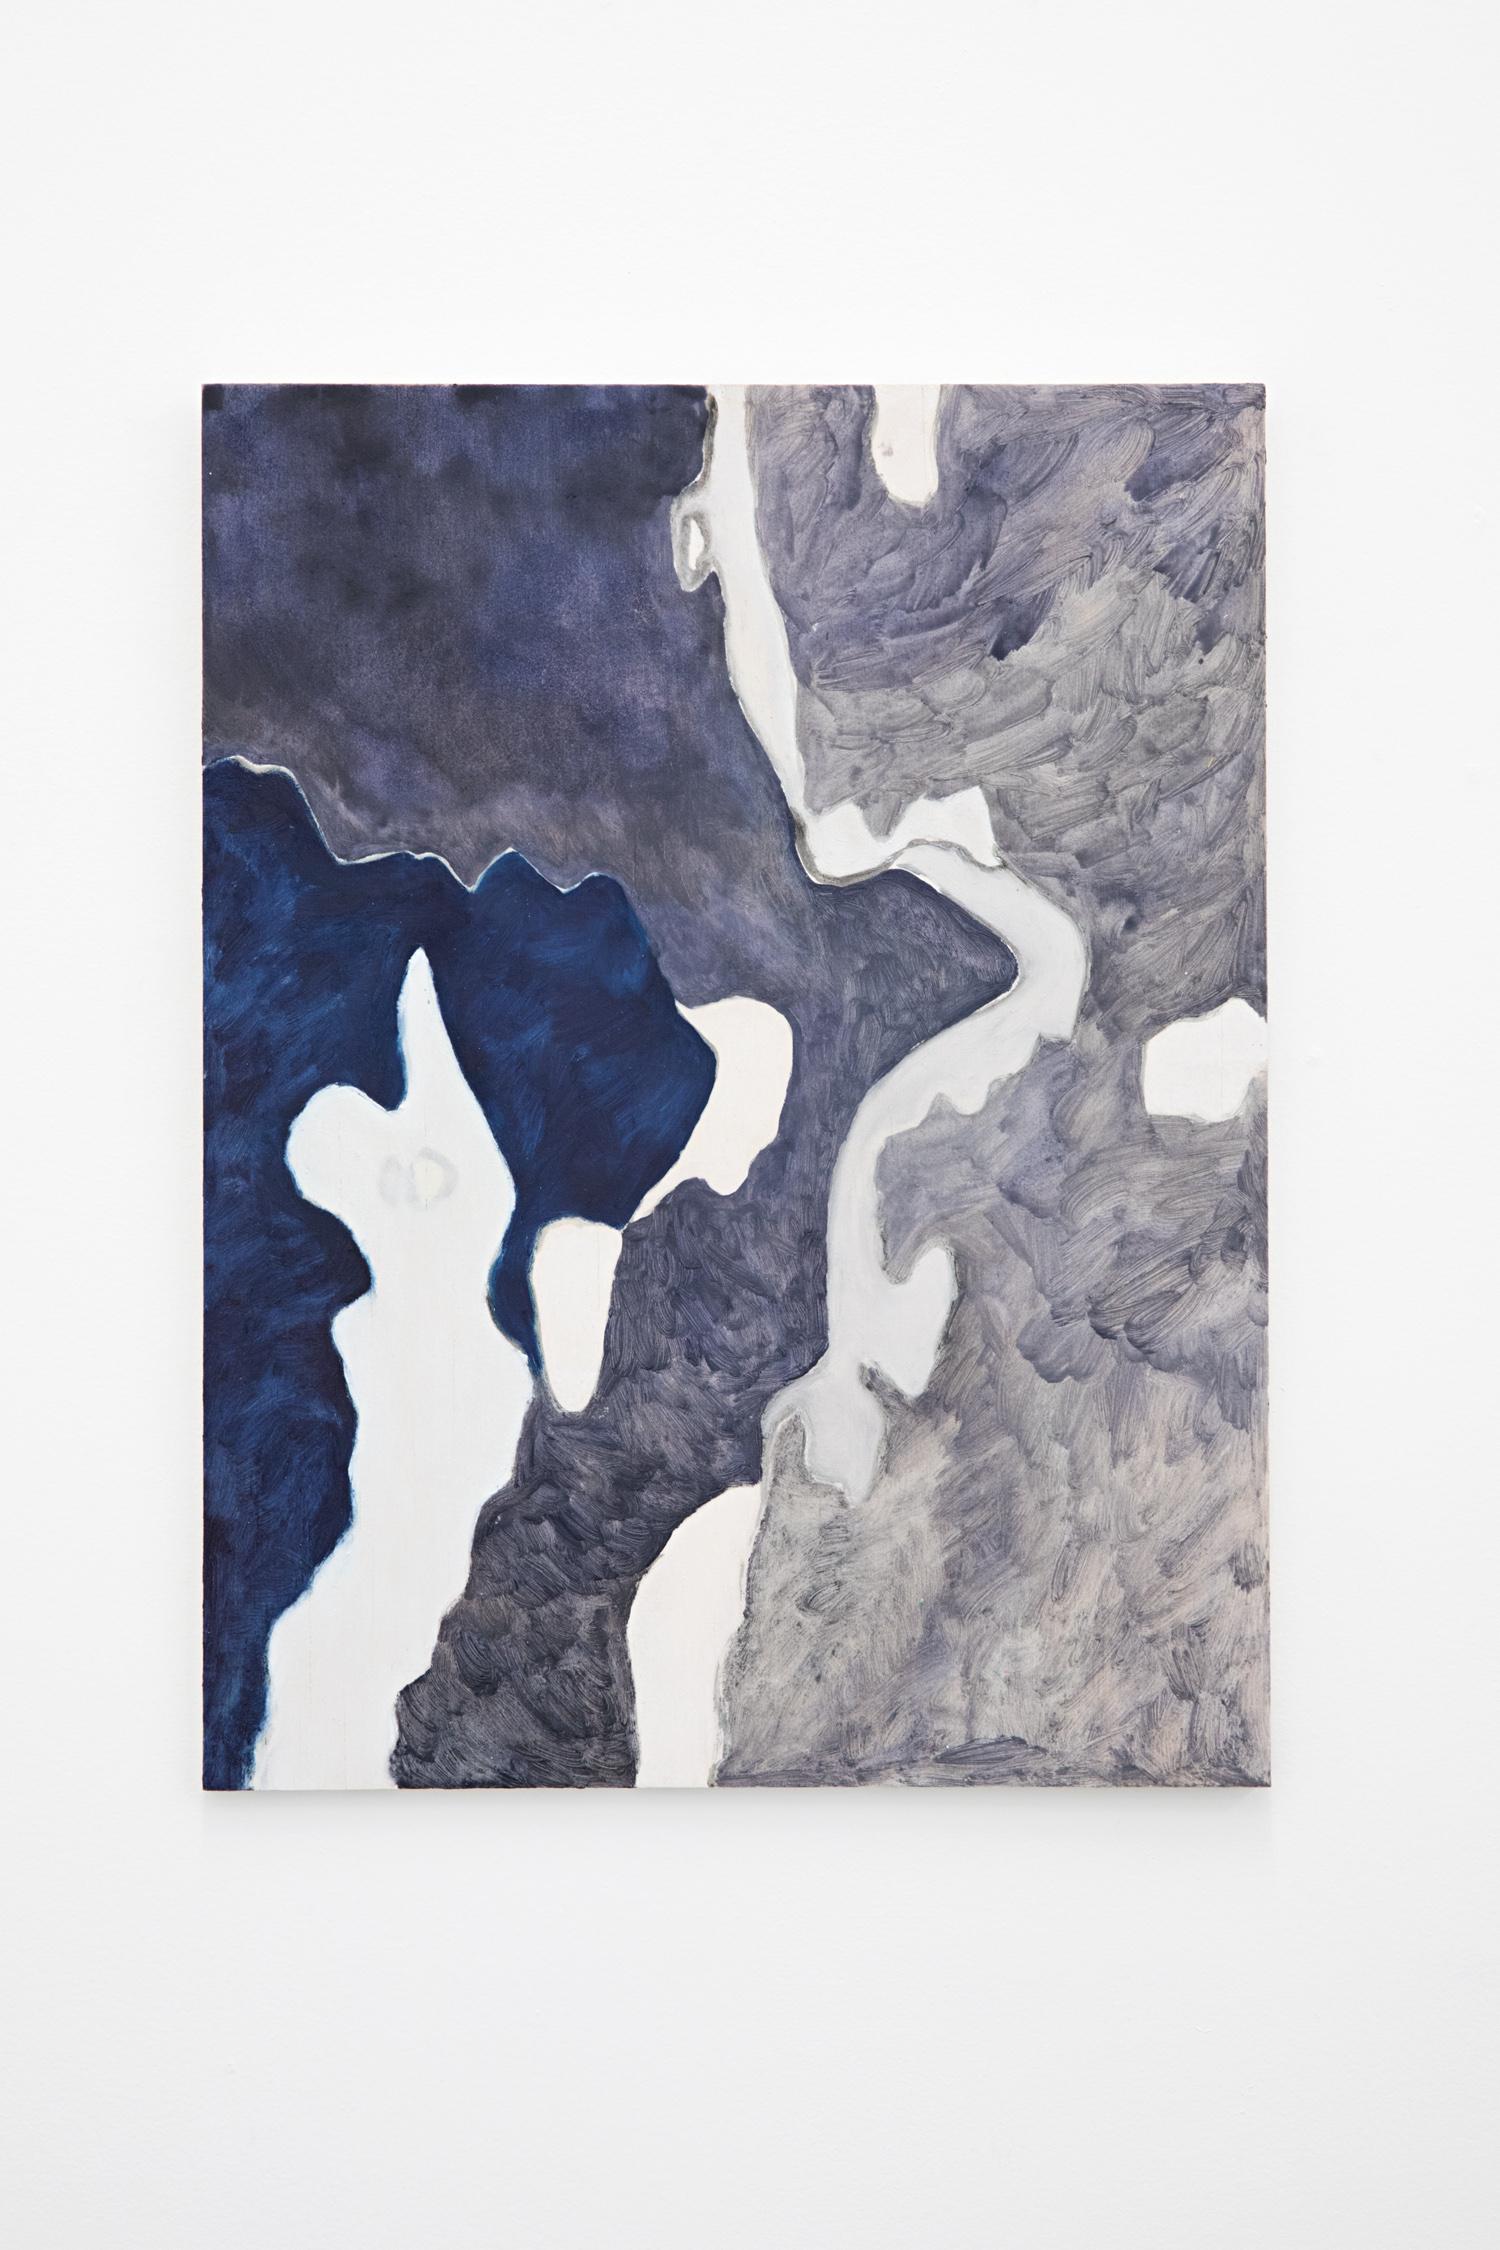 Payne's Grey (hot surface shapes)